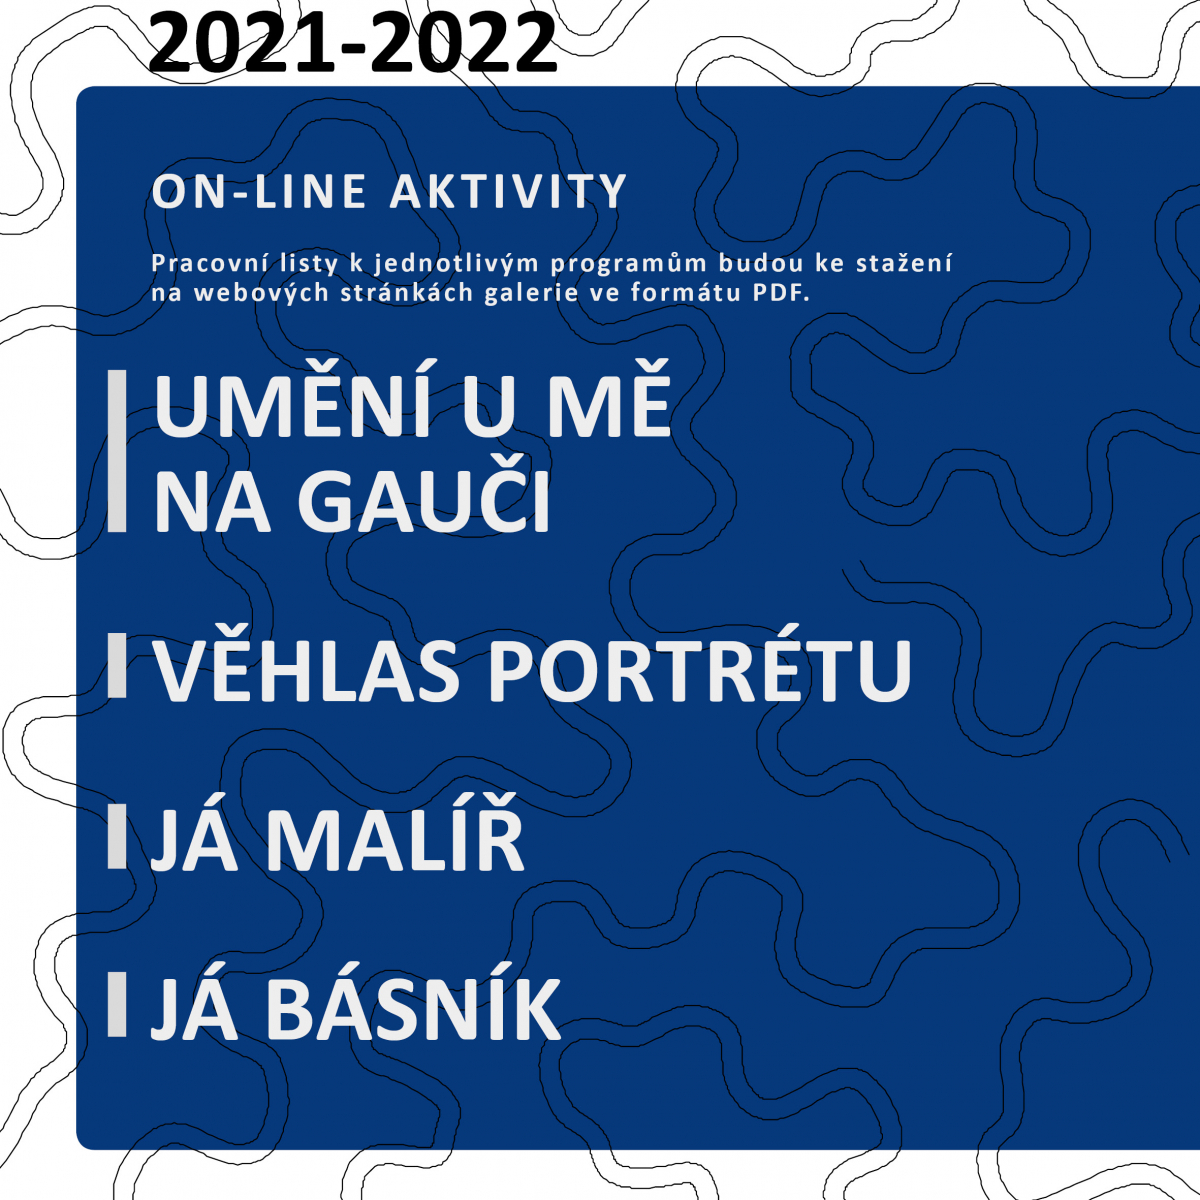 Online aktivity